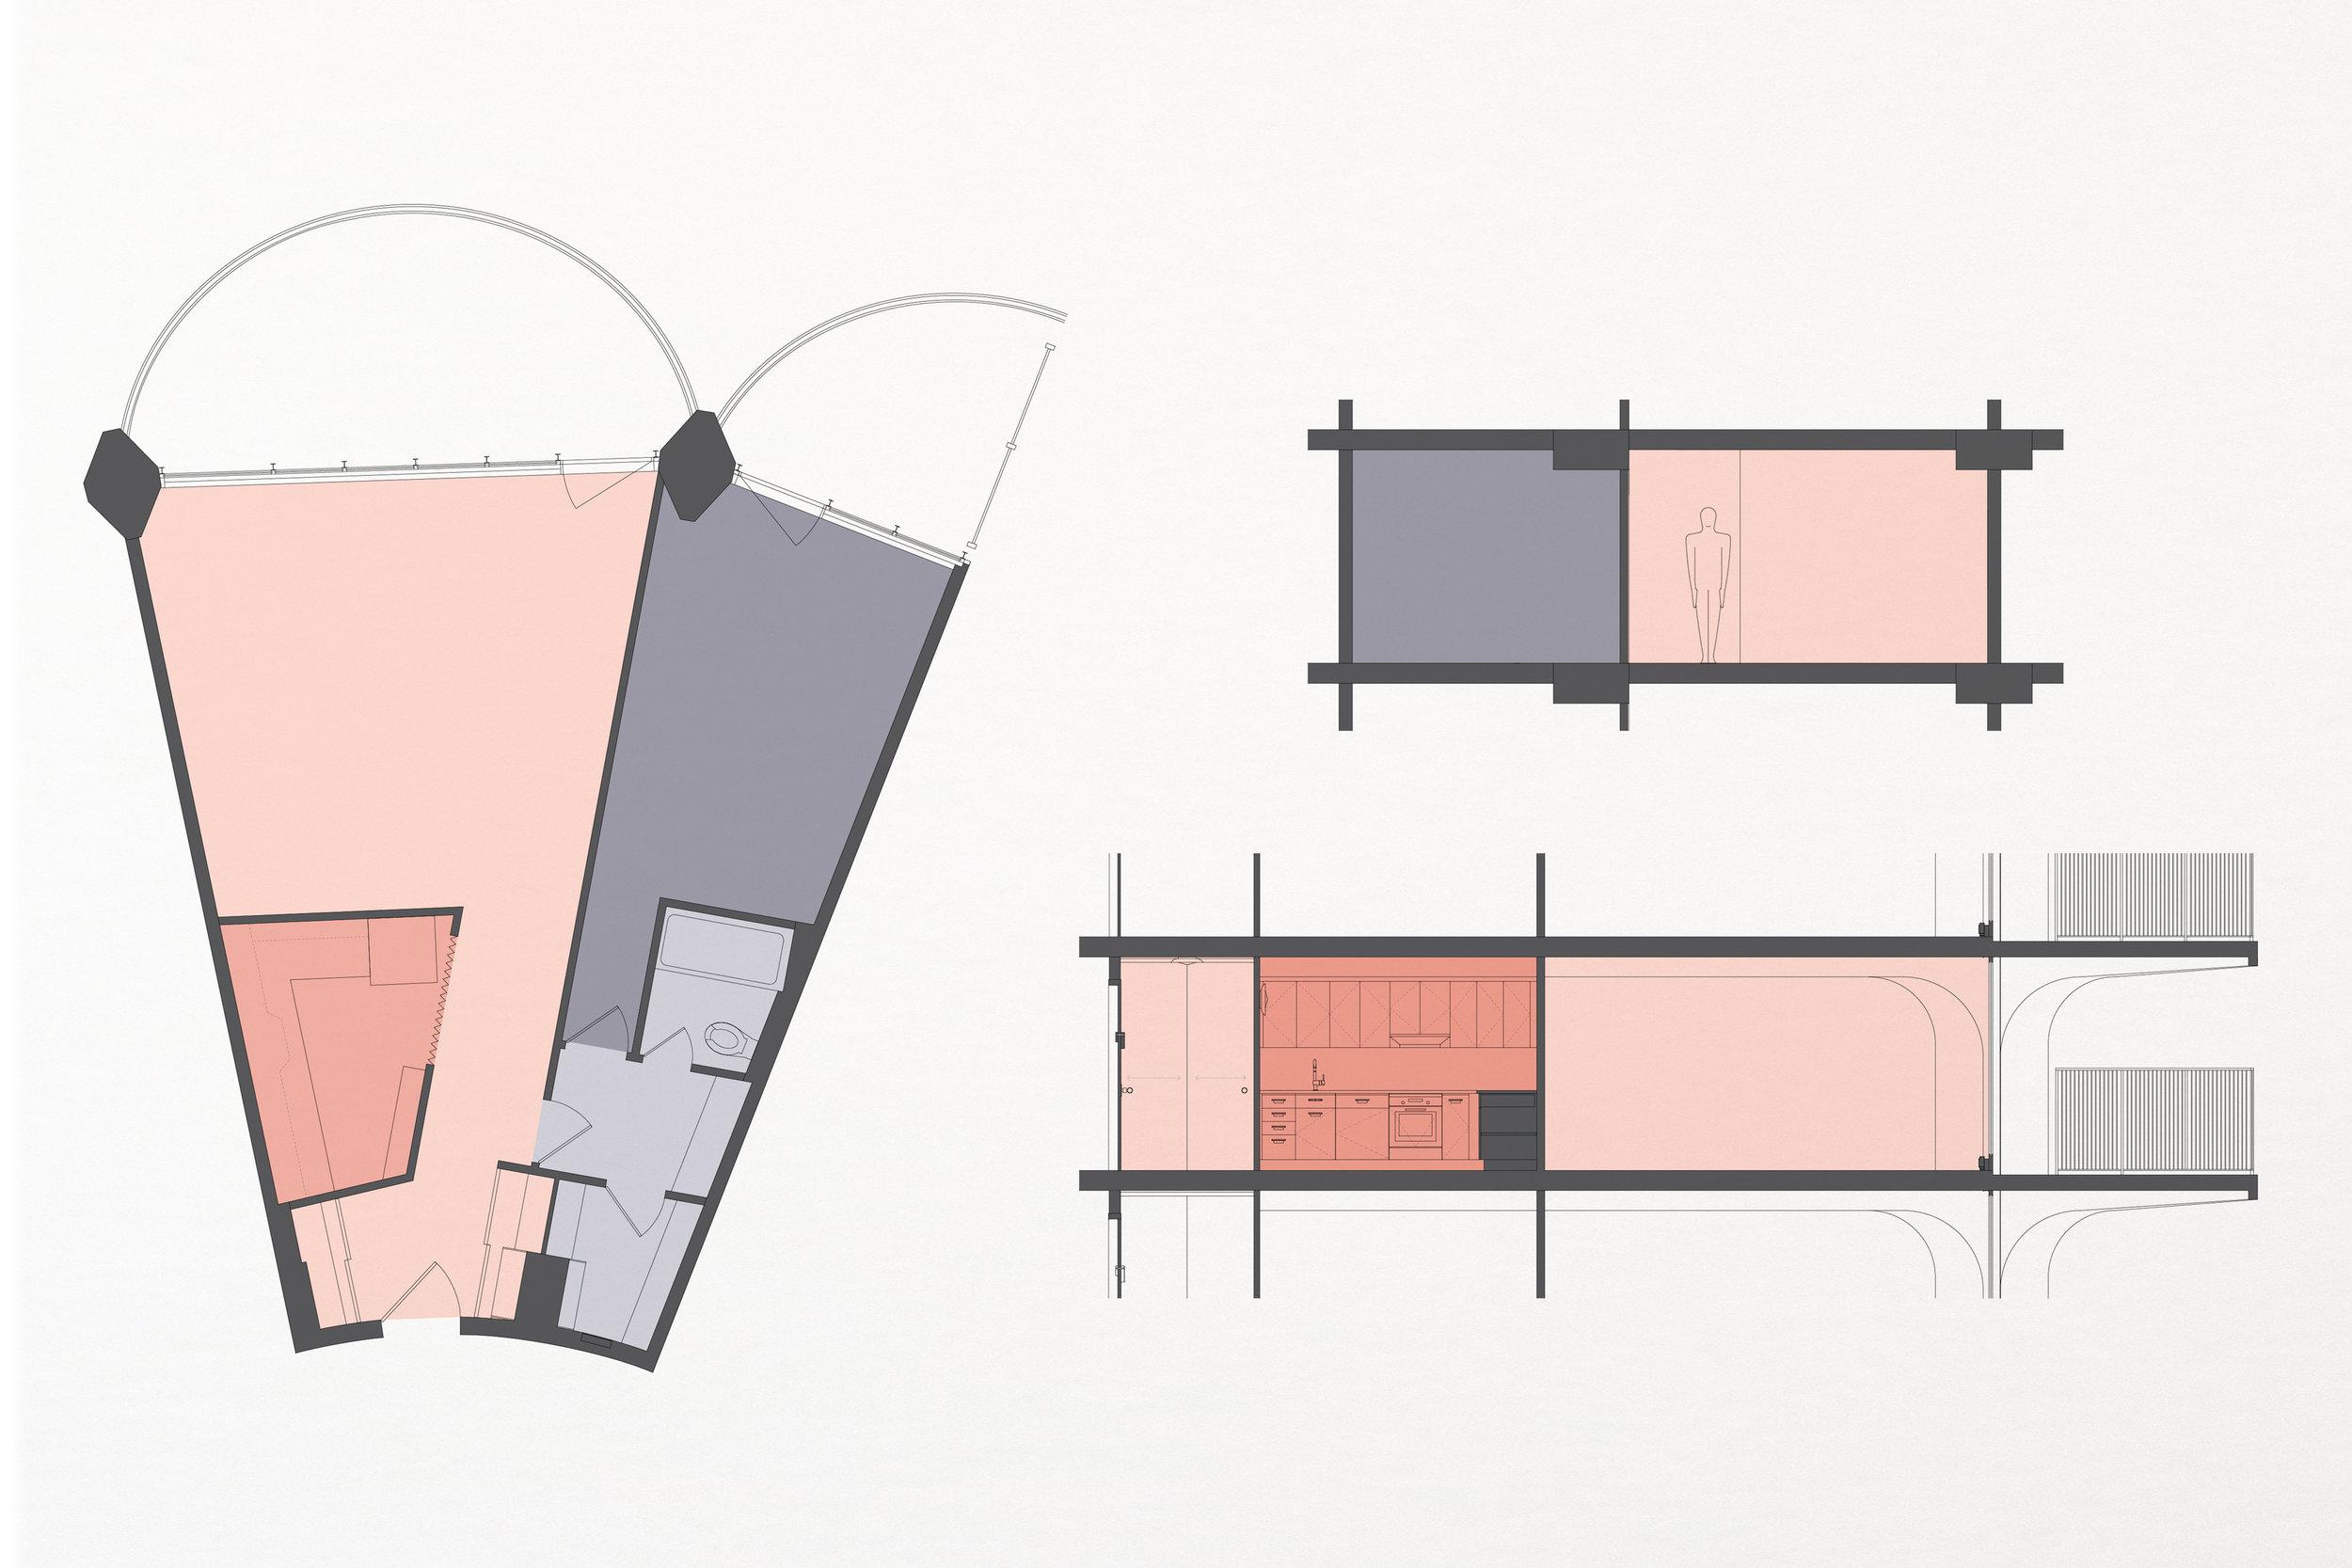 1964: Original layout